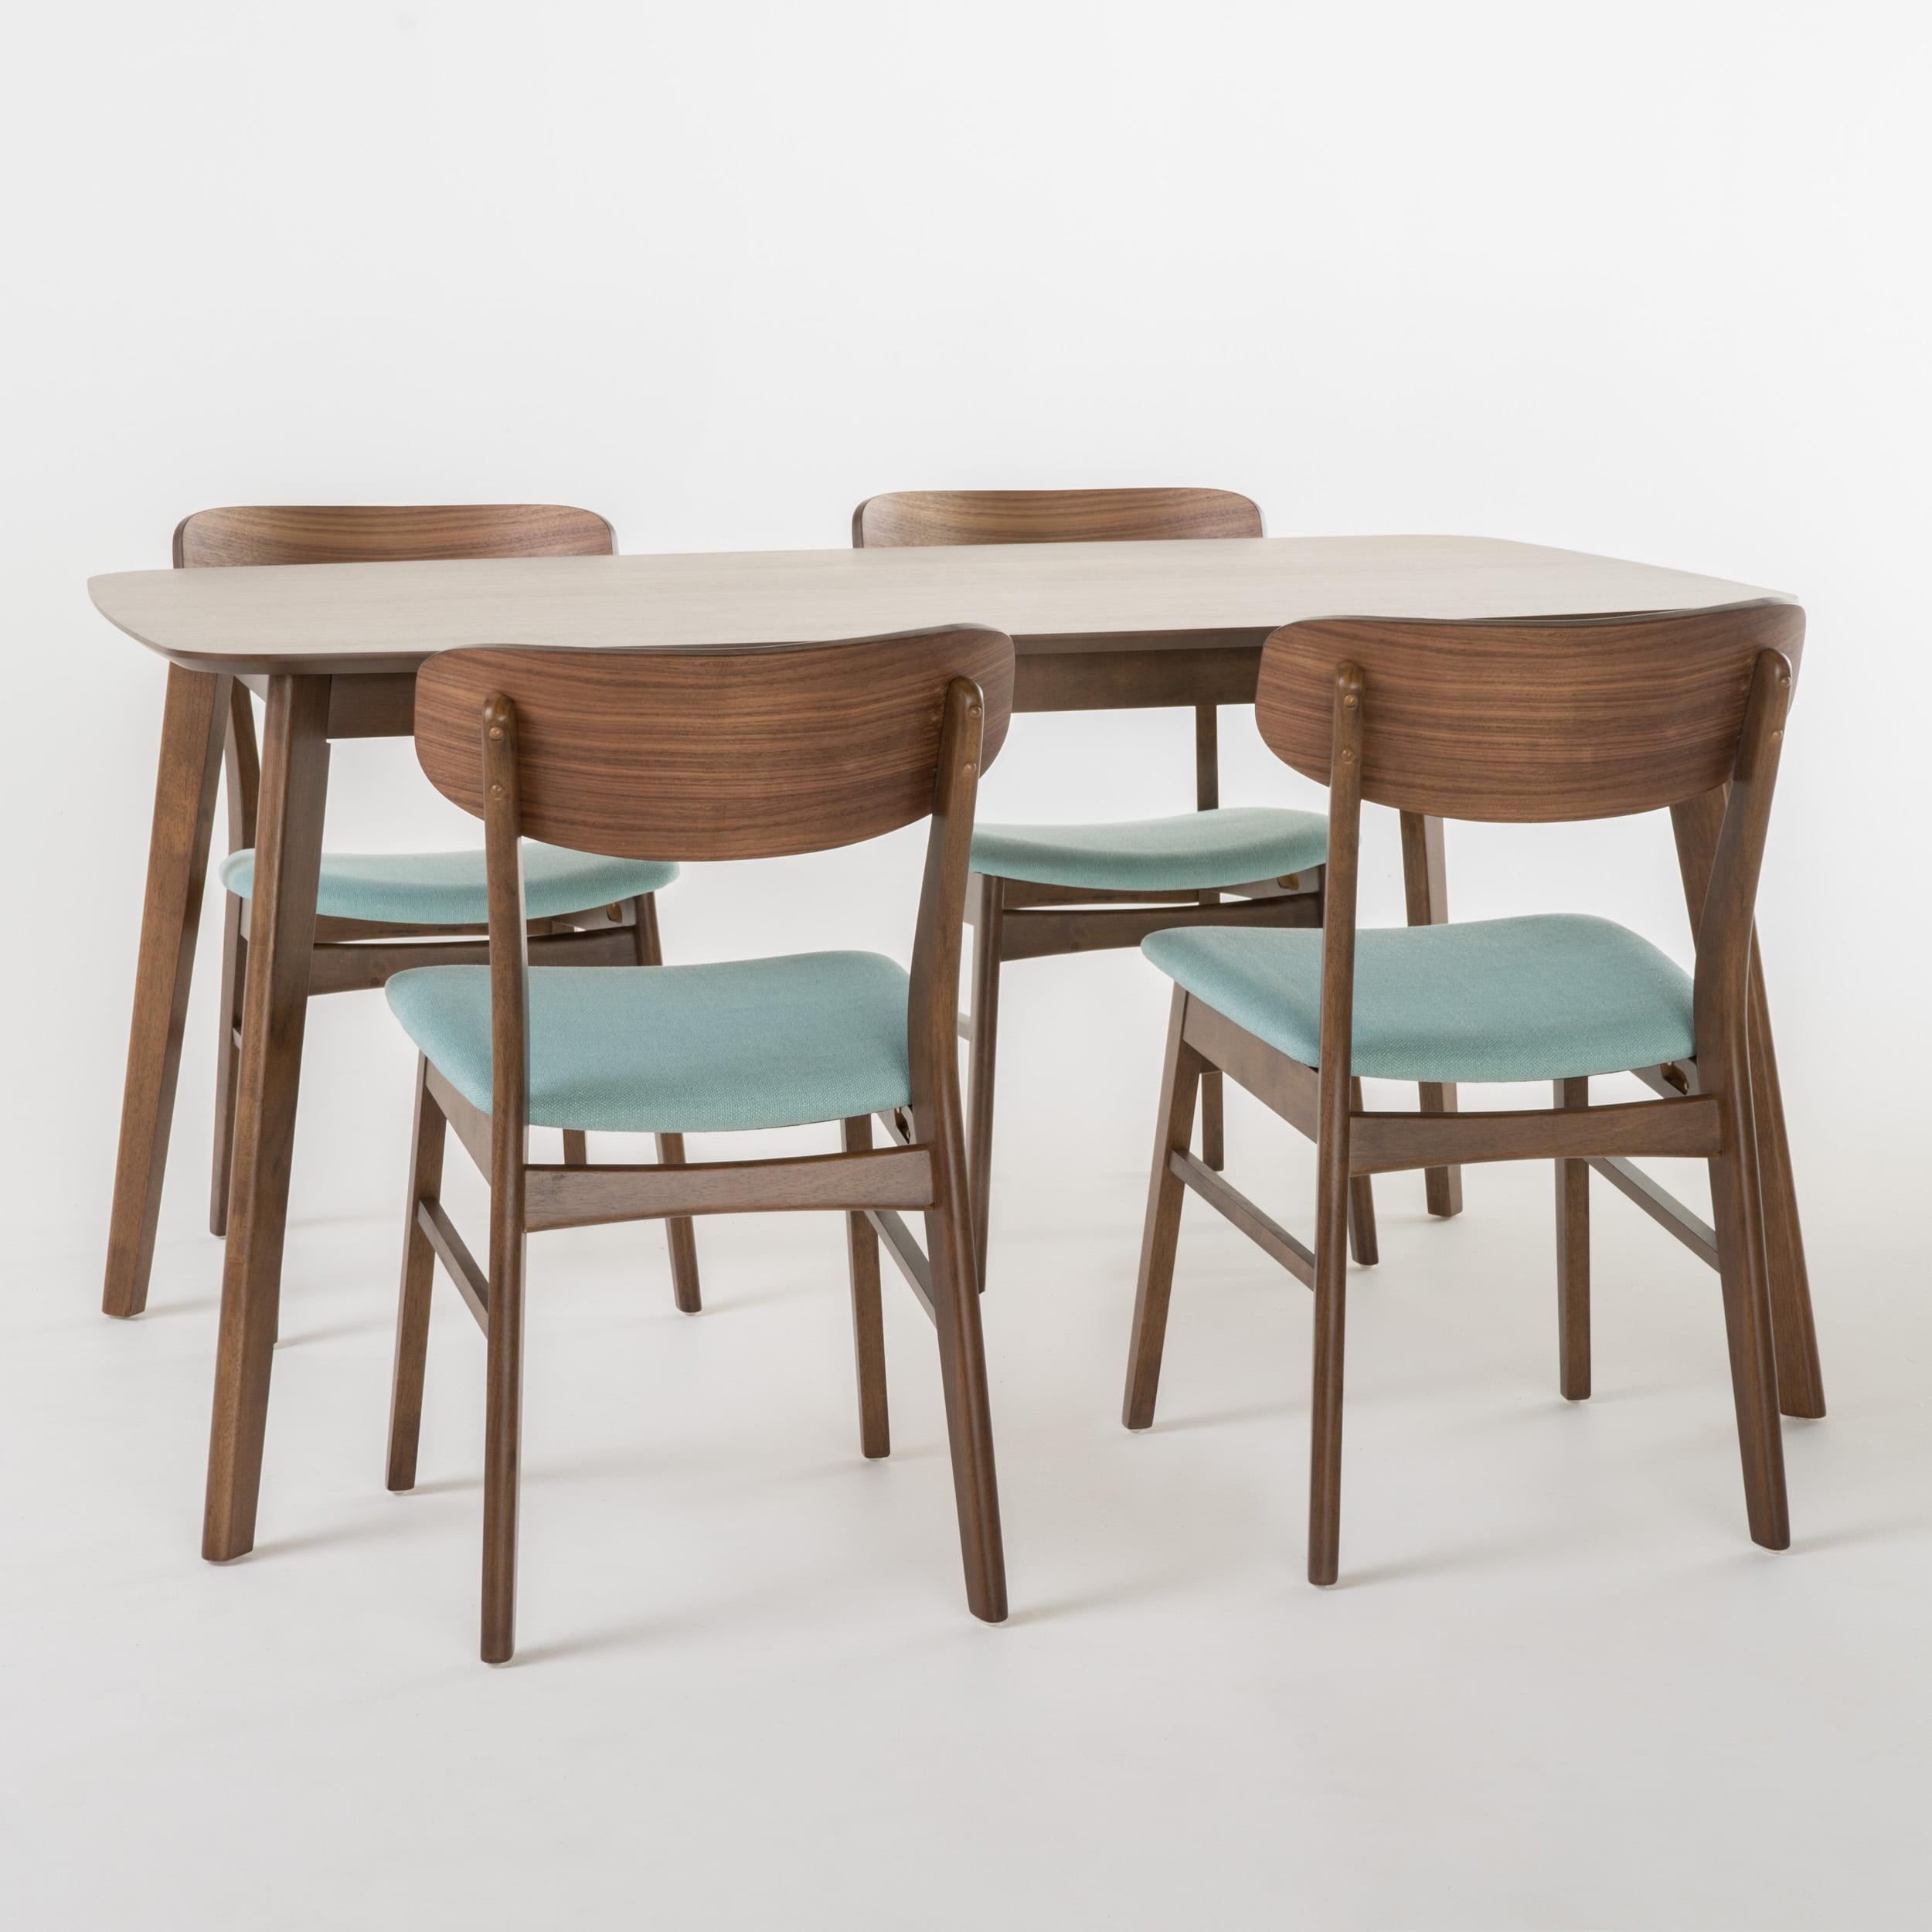 Teigen 60-inch Rectangular 5-Piece Dining Set, Mint, Natural Walnut Finish